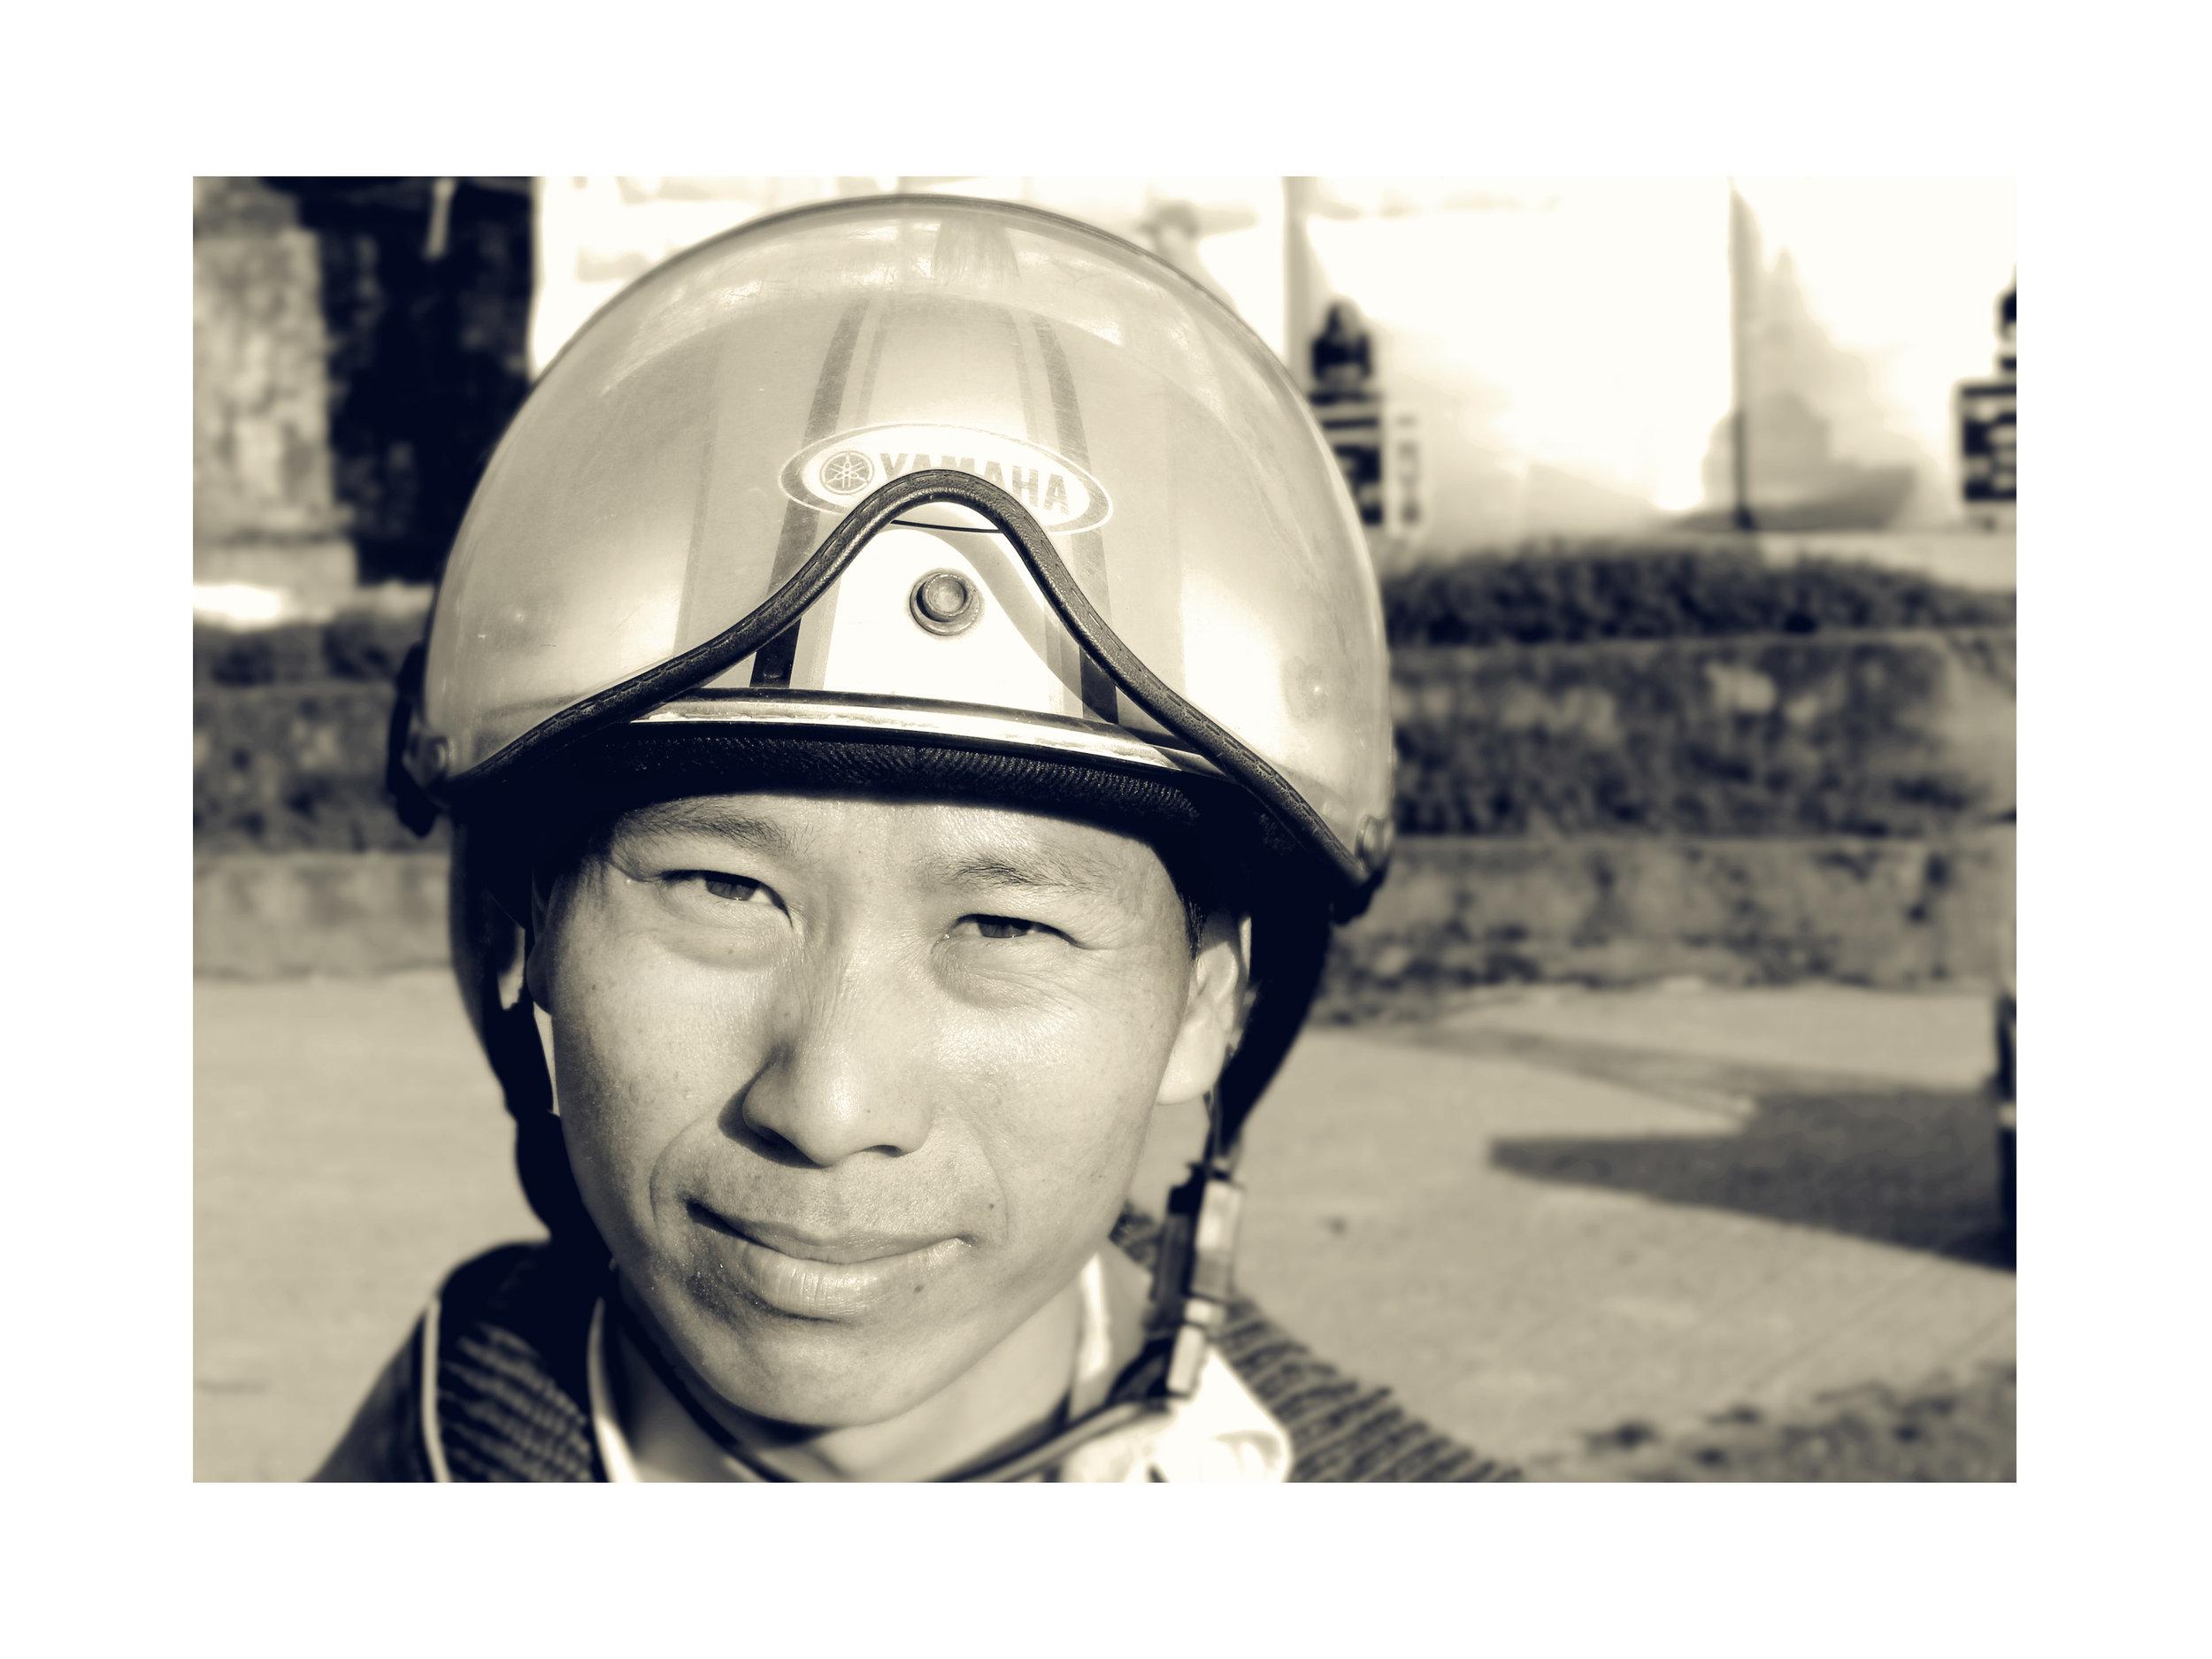 JW_face VI_022.jpg